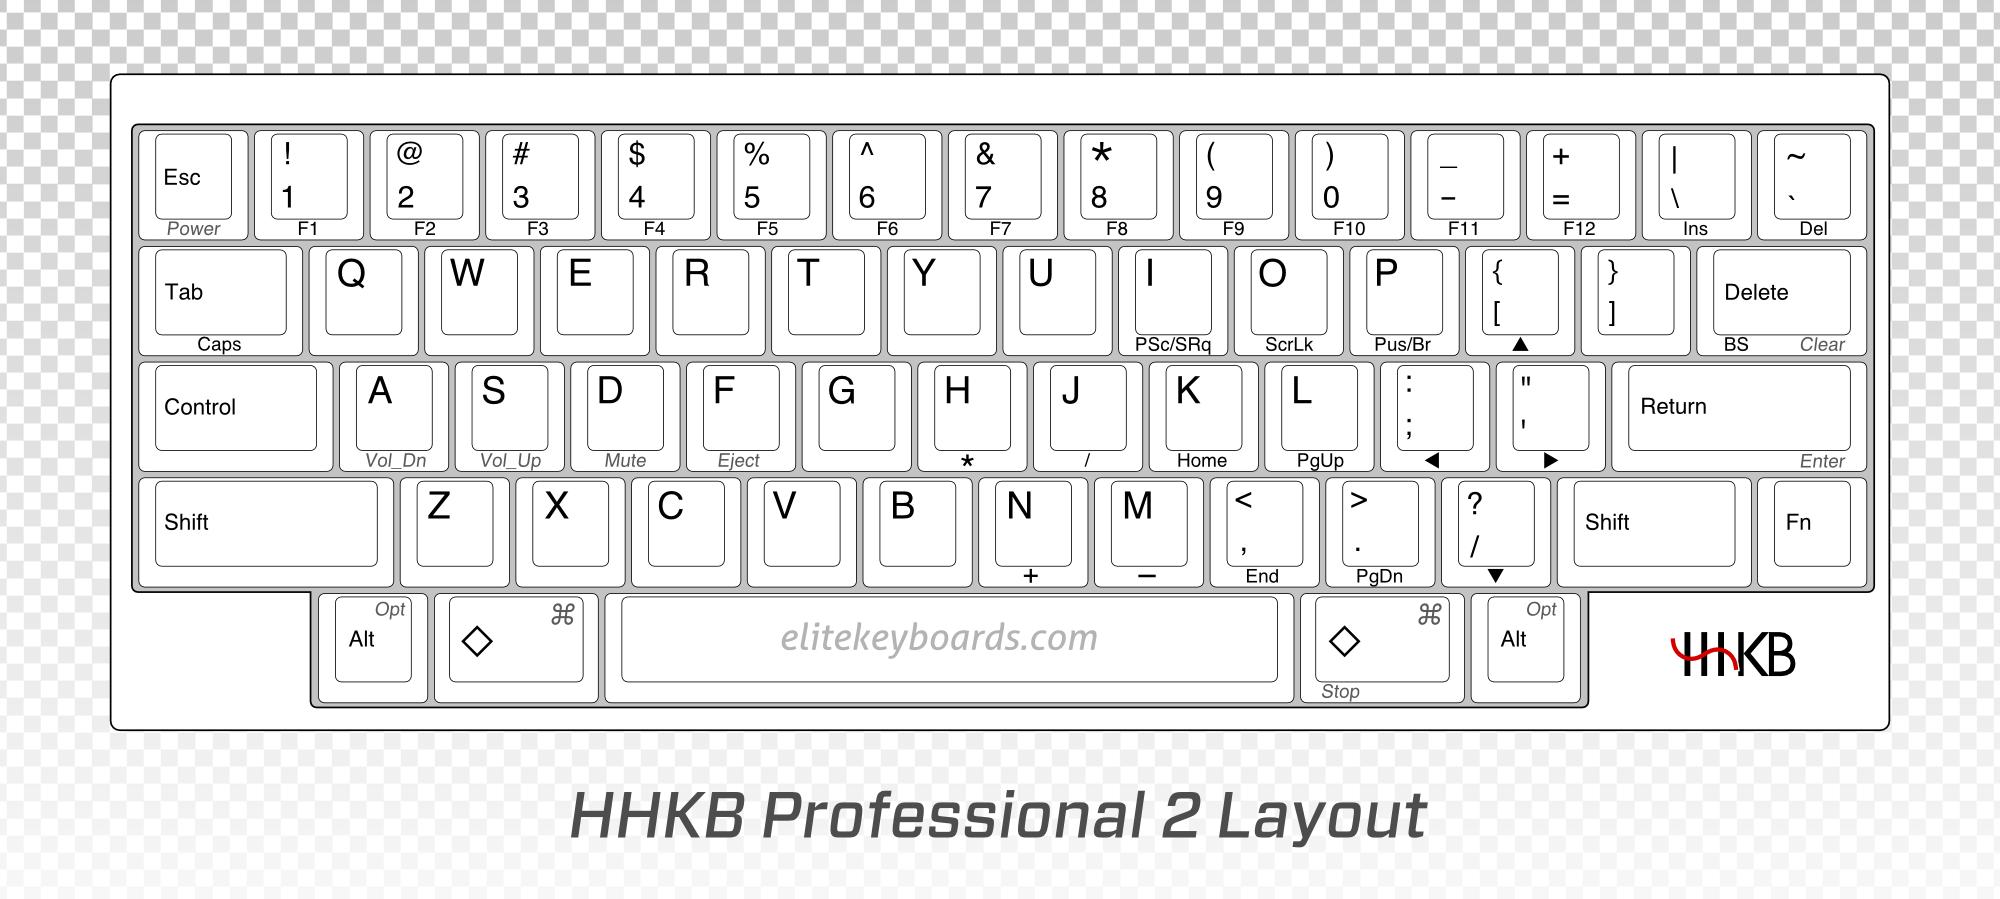 hhkb-layout.png